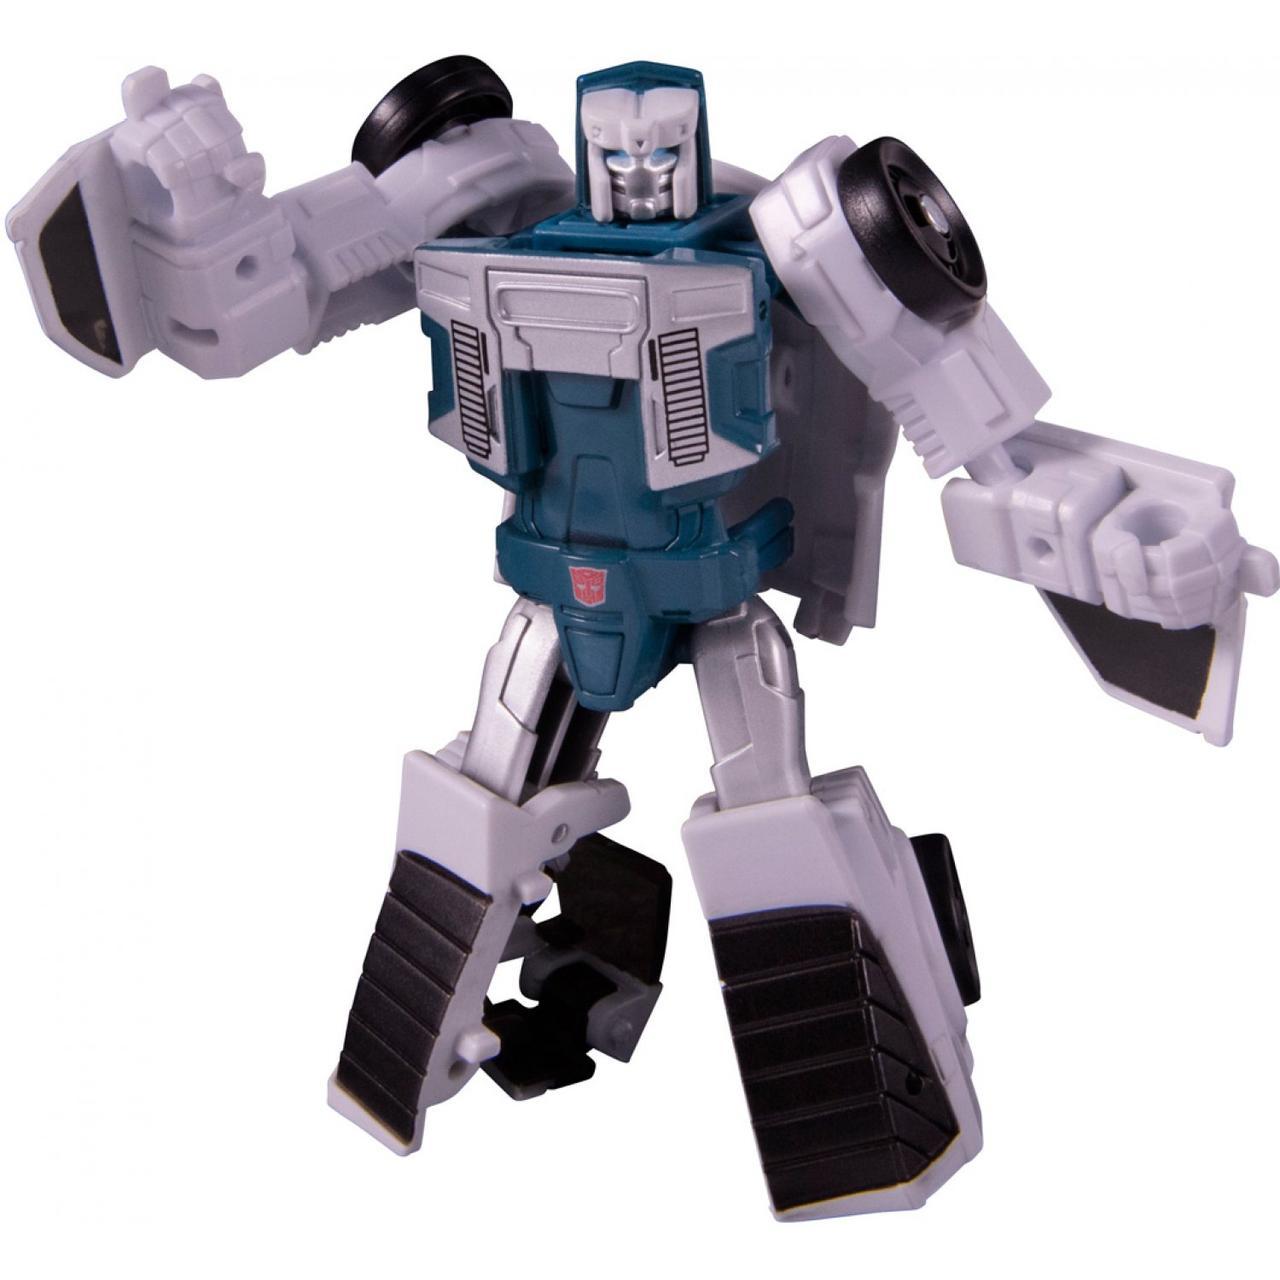 Робот-трансформер Тейлгейт Сила Праймов - Tailgate, Power of the Primes, Legends Class, Hasbro